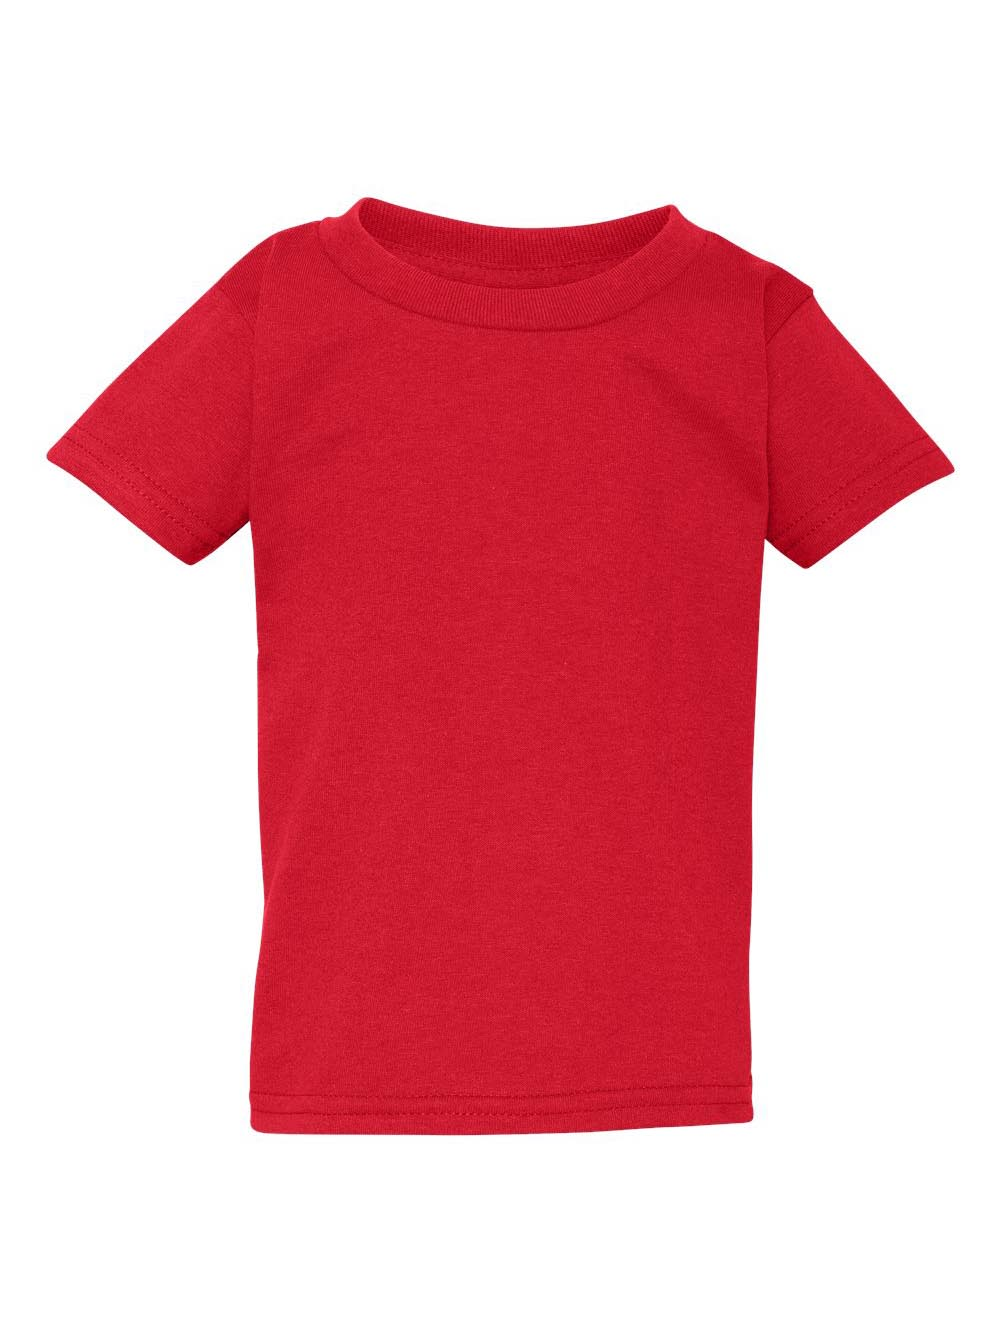 Gildan - Heavy Cotton Toddler T-Shirt - 5100P